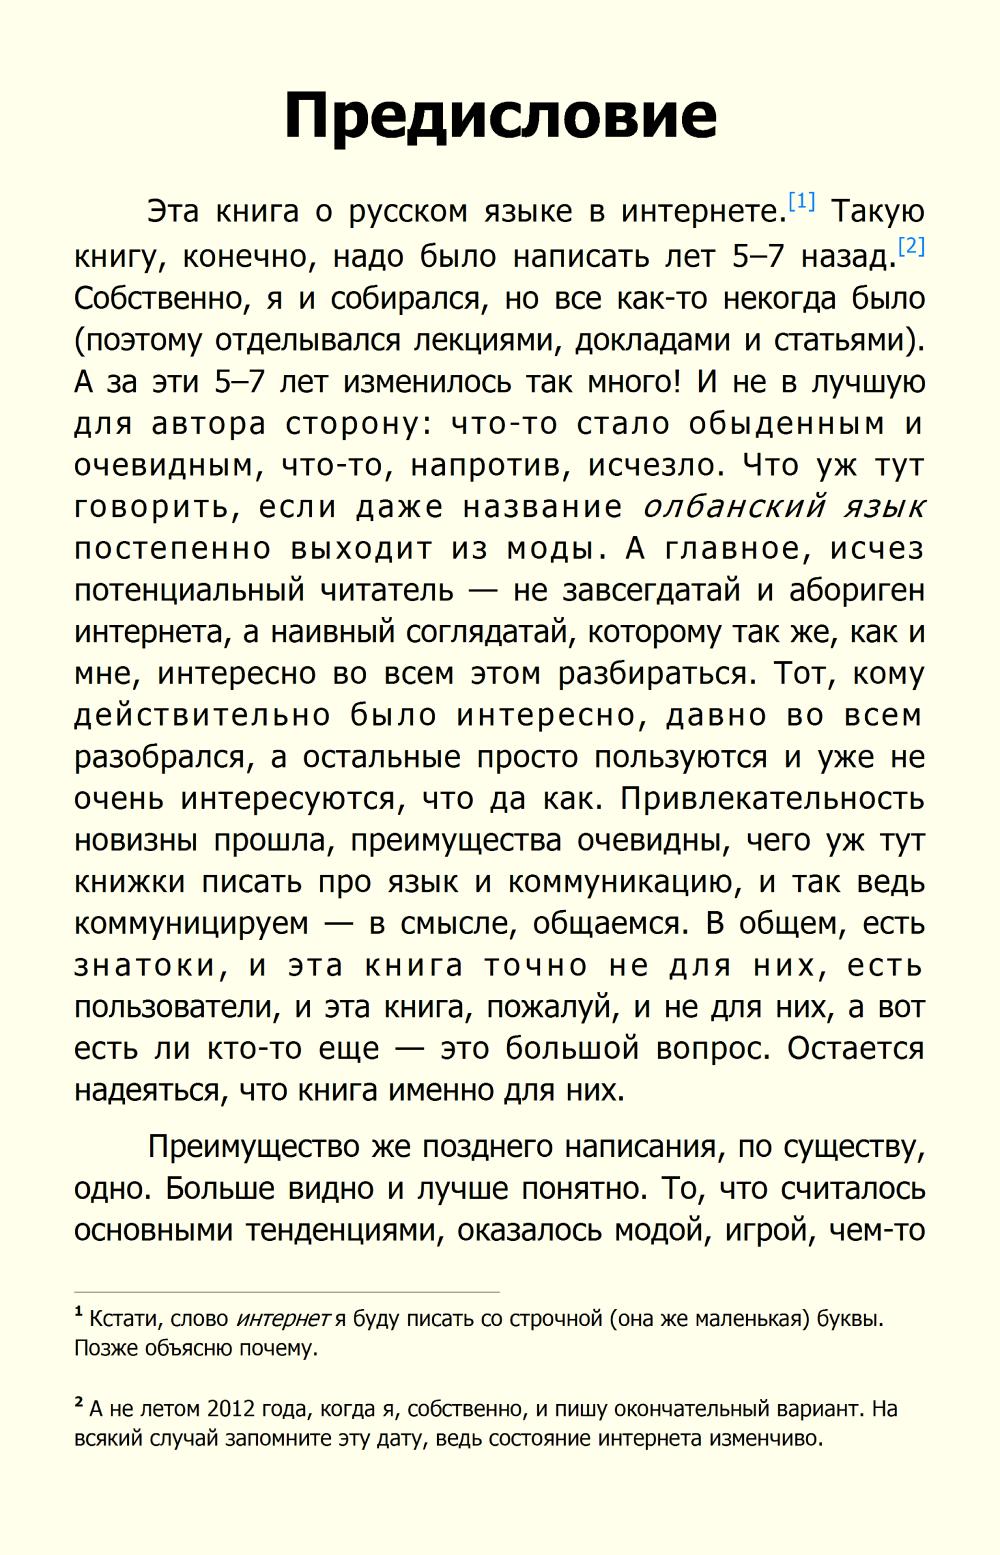 http://i5.imageban.ru/out/2013/11/27/9fdefff88637cf16a7ffb280f41b99da.jpg